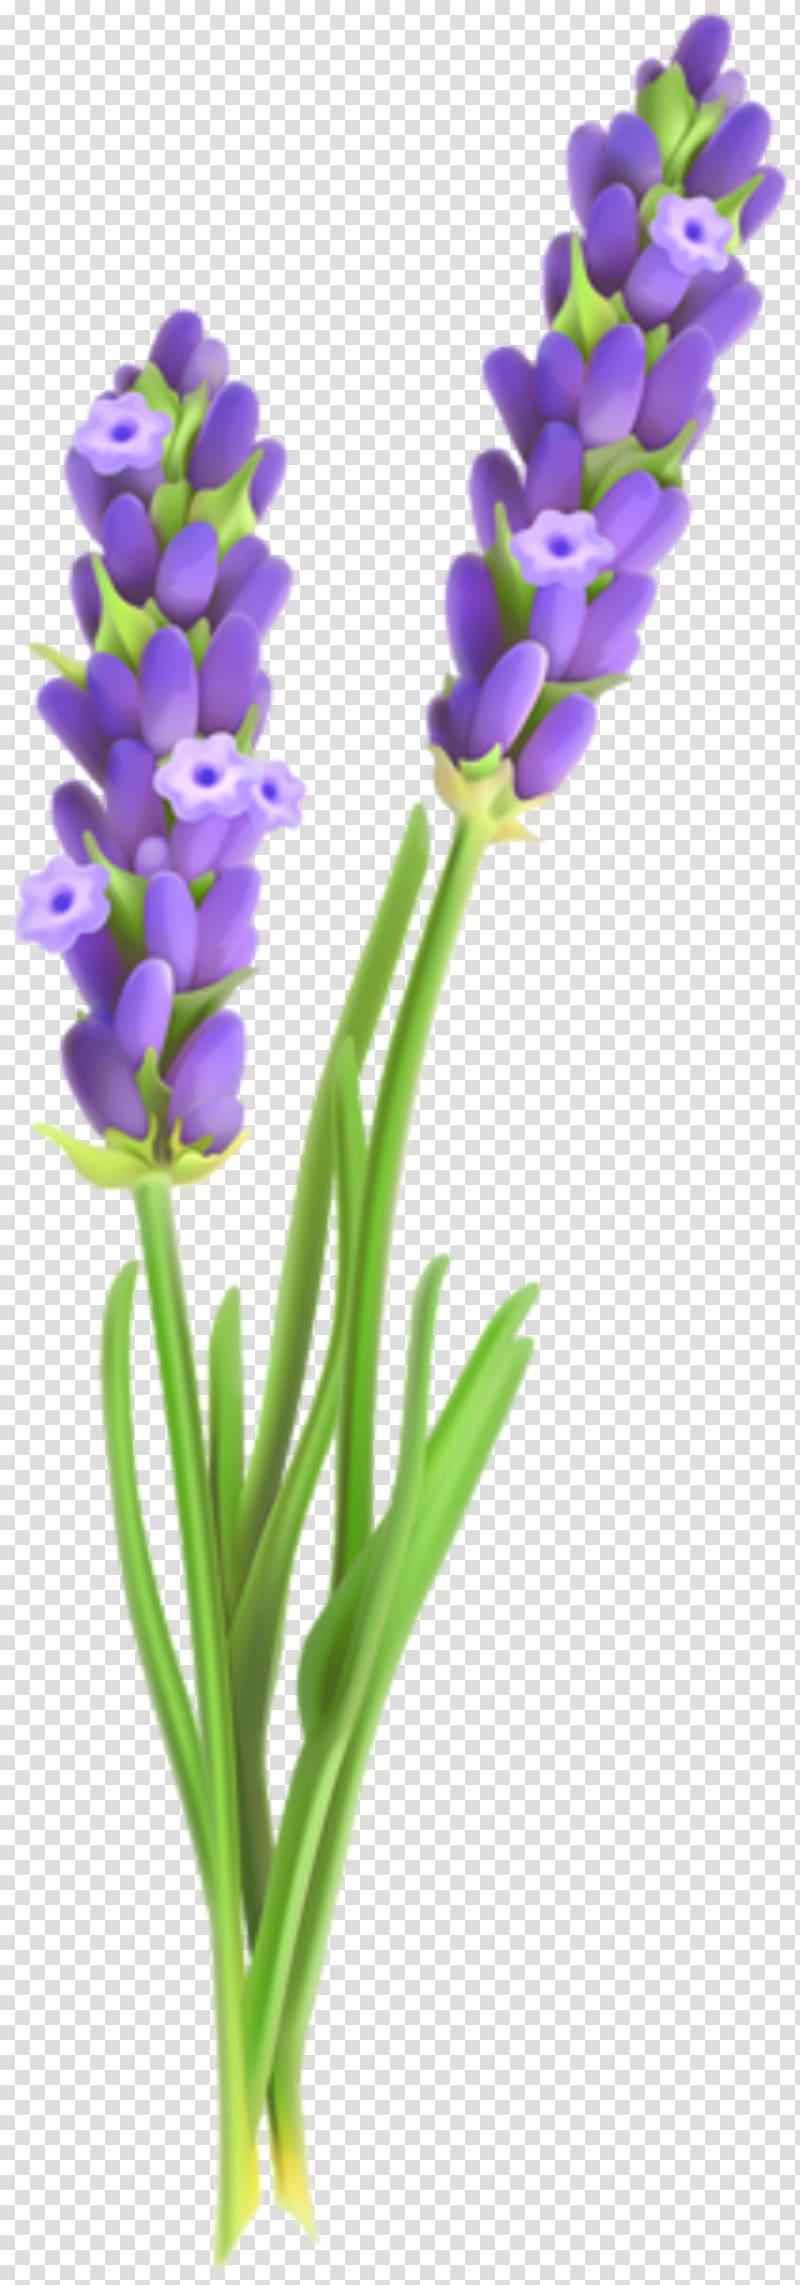 English lavender Lavender oil Plant Lavandula latifolia.